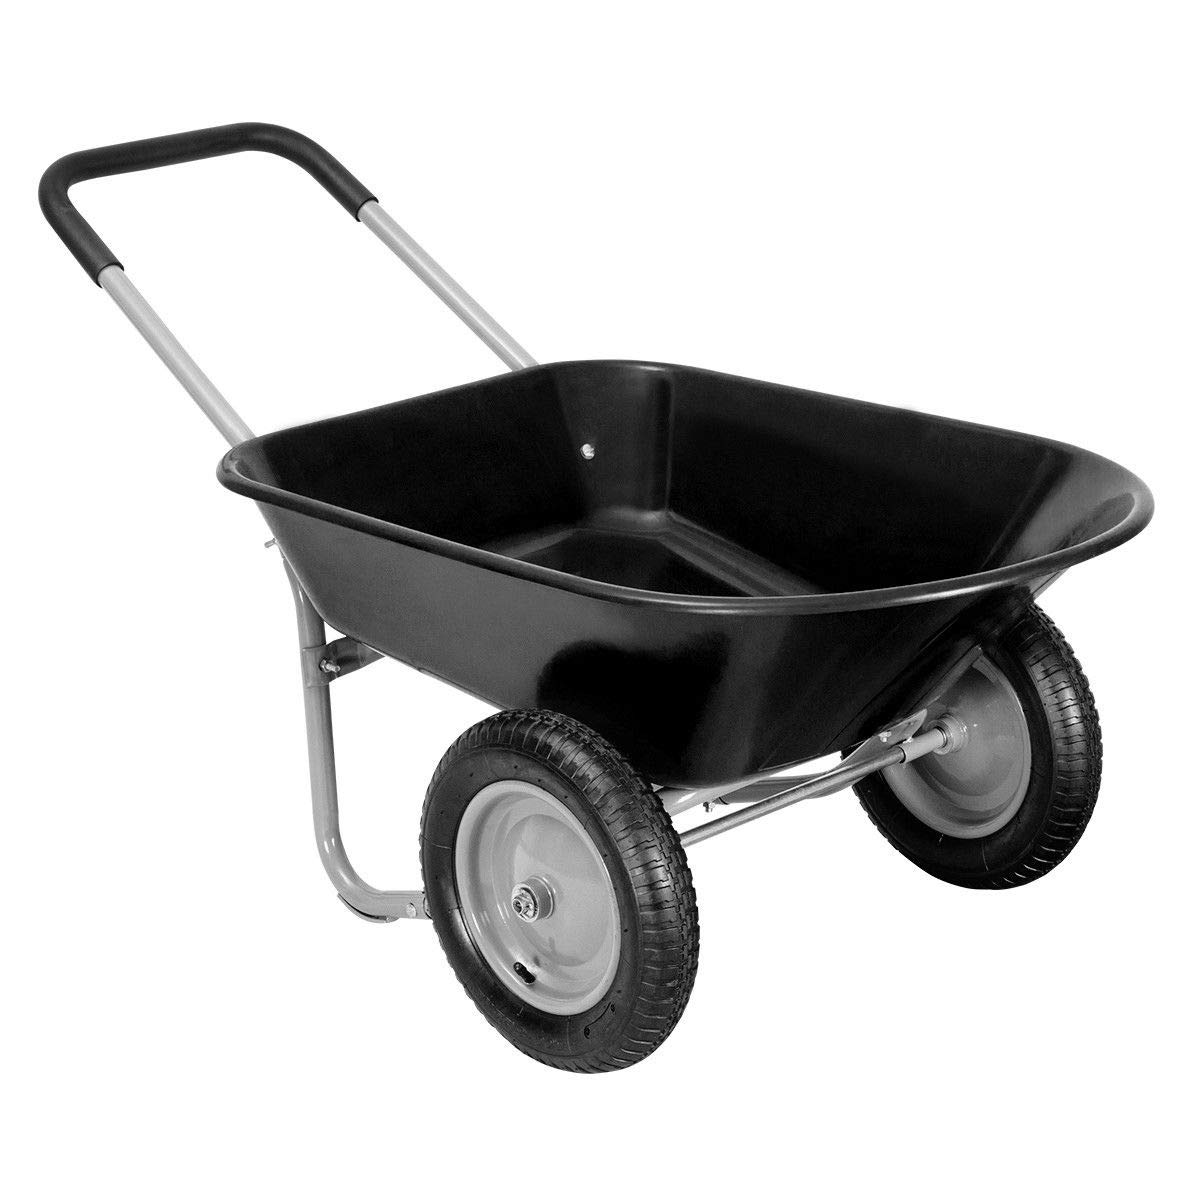 Giantex 2 Tire Wheelbarrow Yard Garden Cart Heavy Duty Landscape Wagon for Outdoor Lawn Use Utility Hualing Cart 330Lbs Load Capacity, Black by Giantex